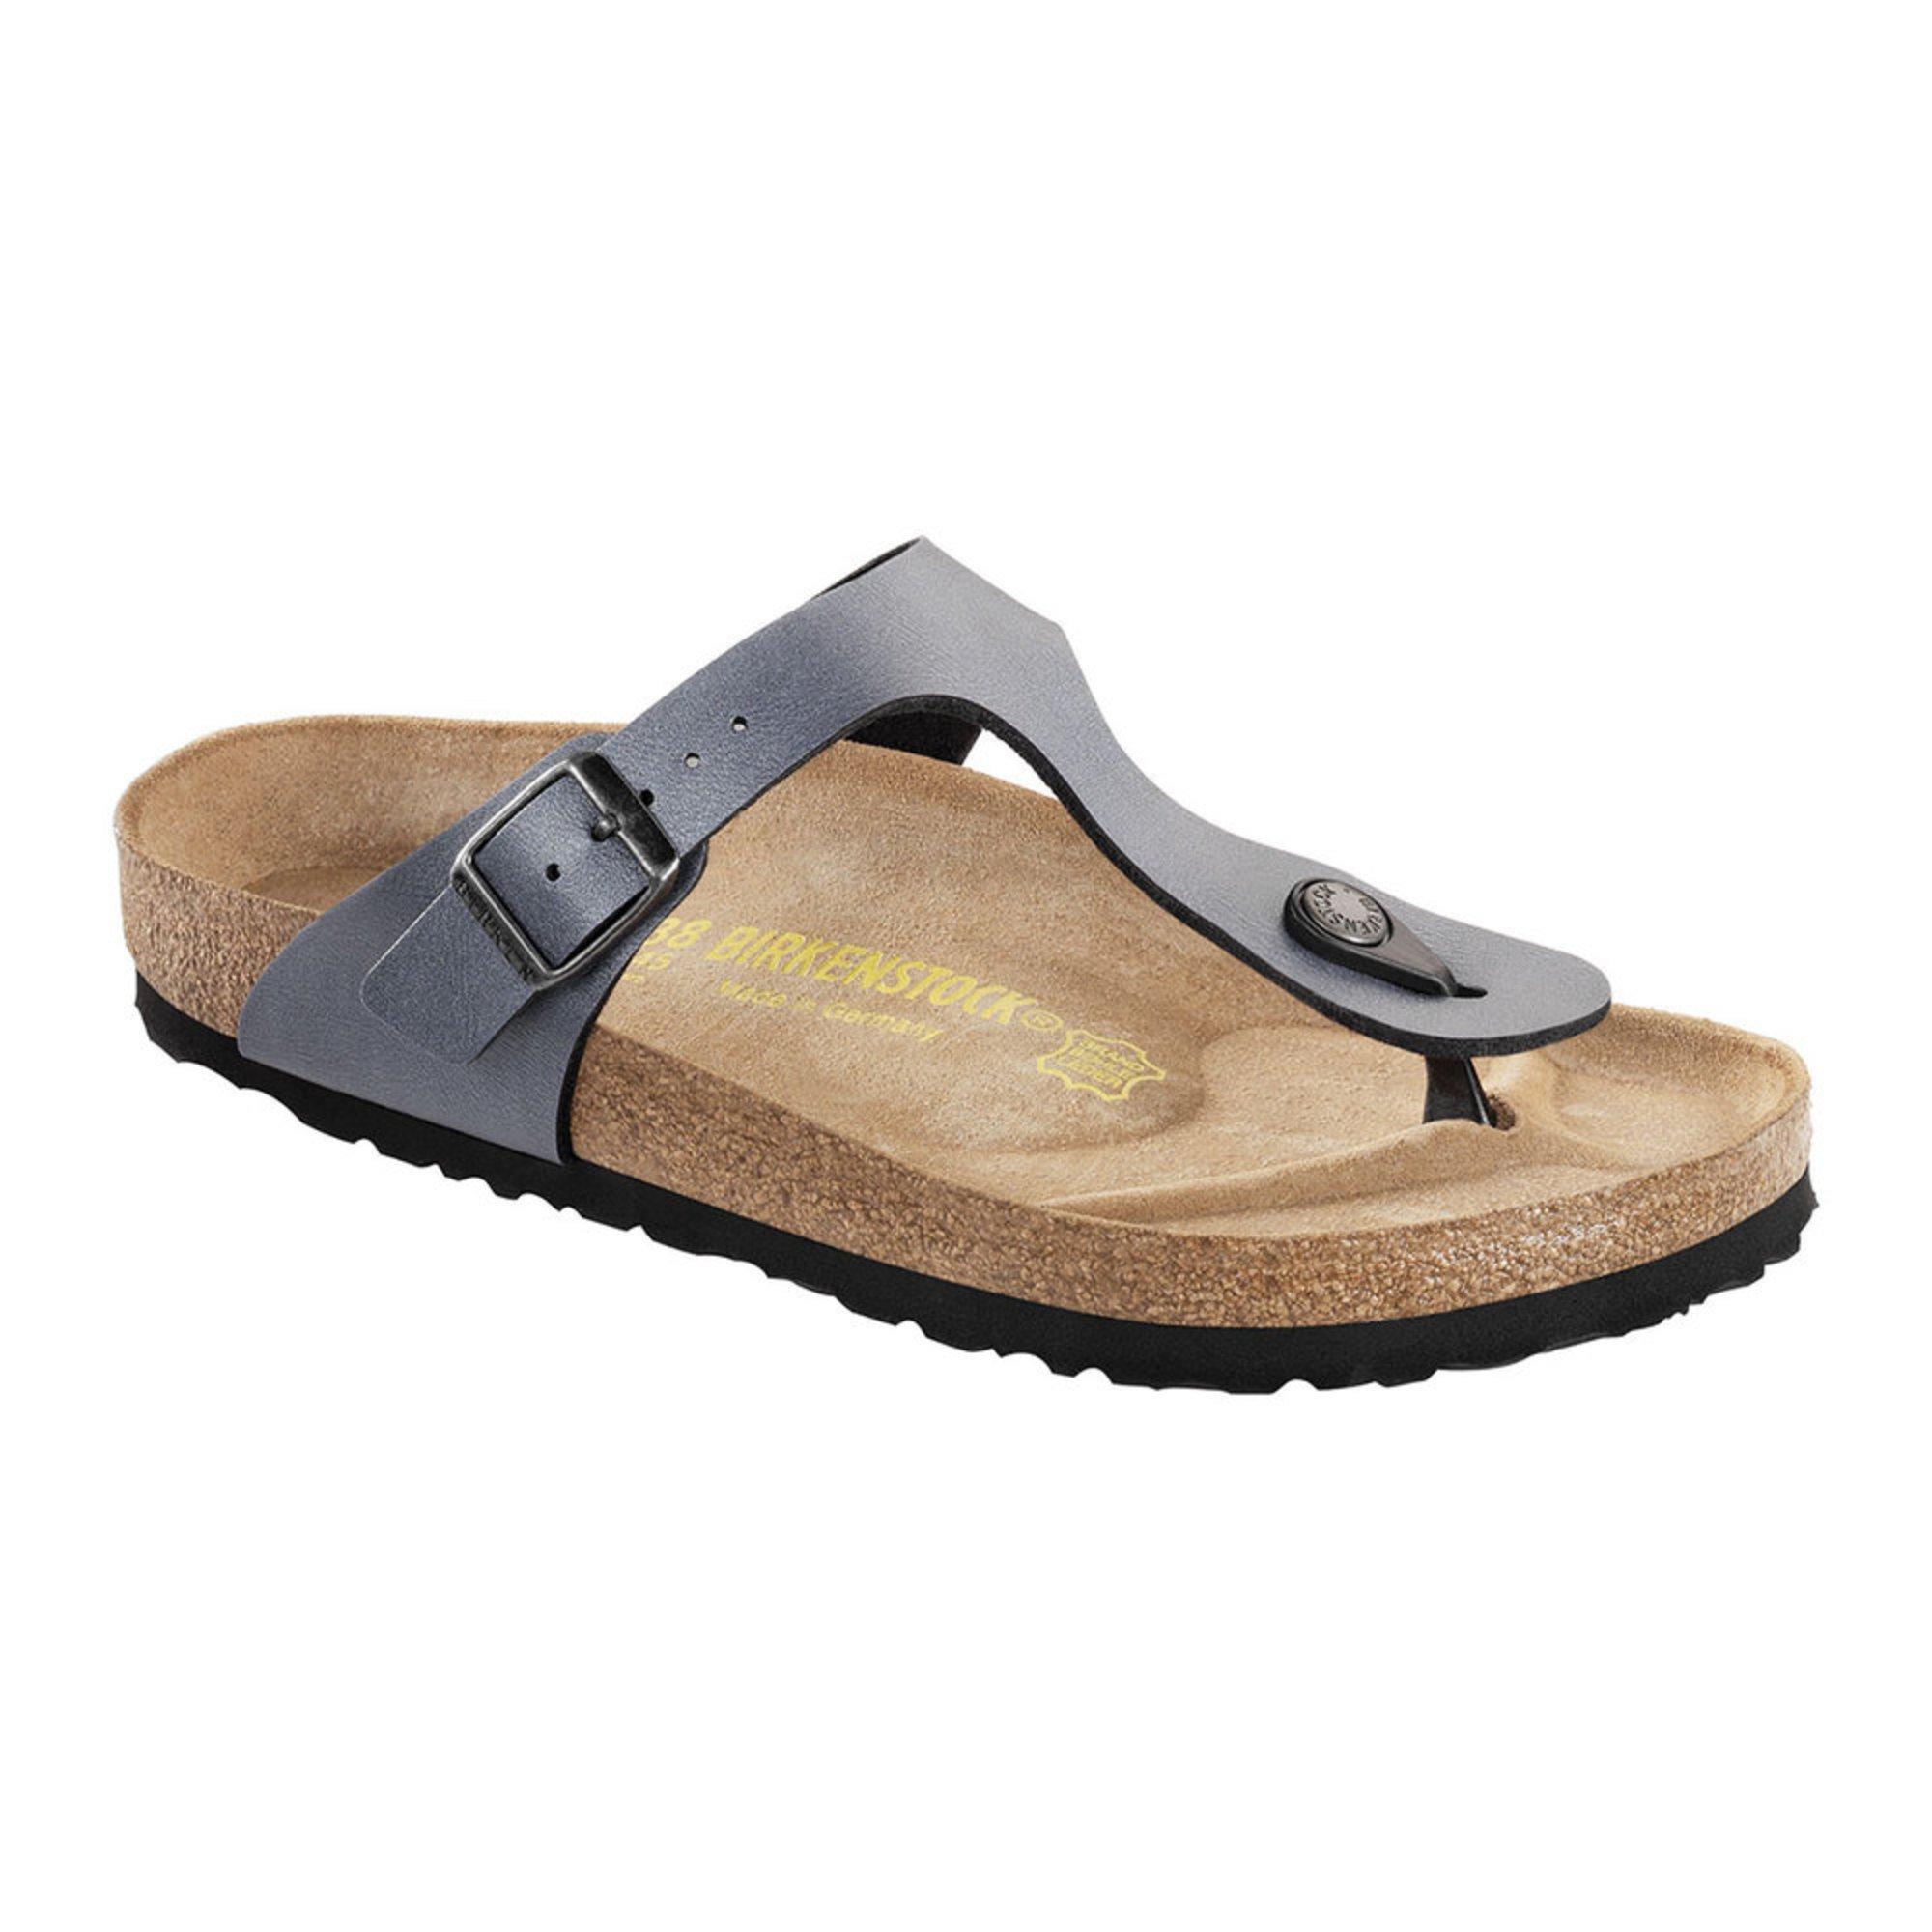 Birkenstock Women's Gizeh SandalWomen's Birkoflor SandalsShoes 6vmfYgb7Iy